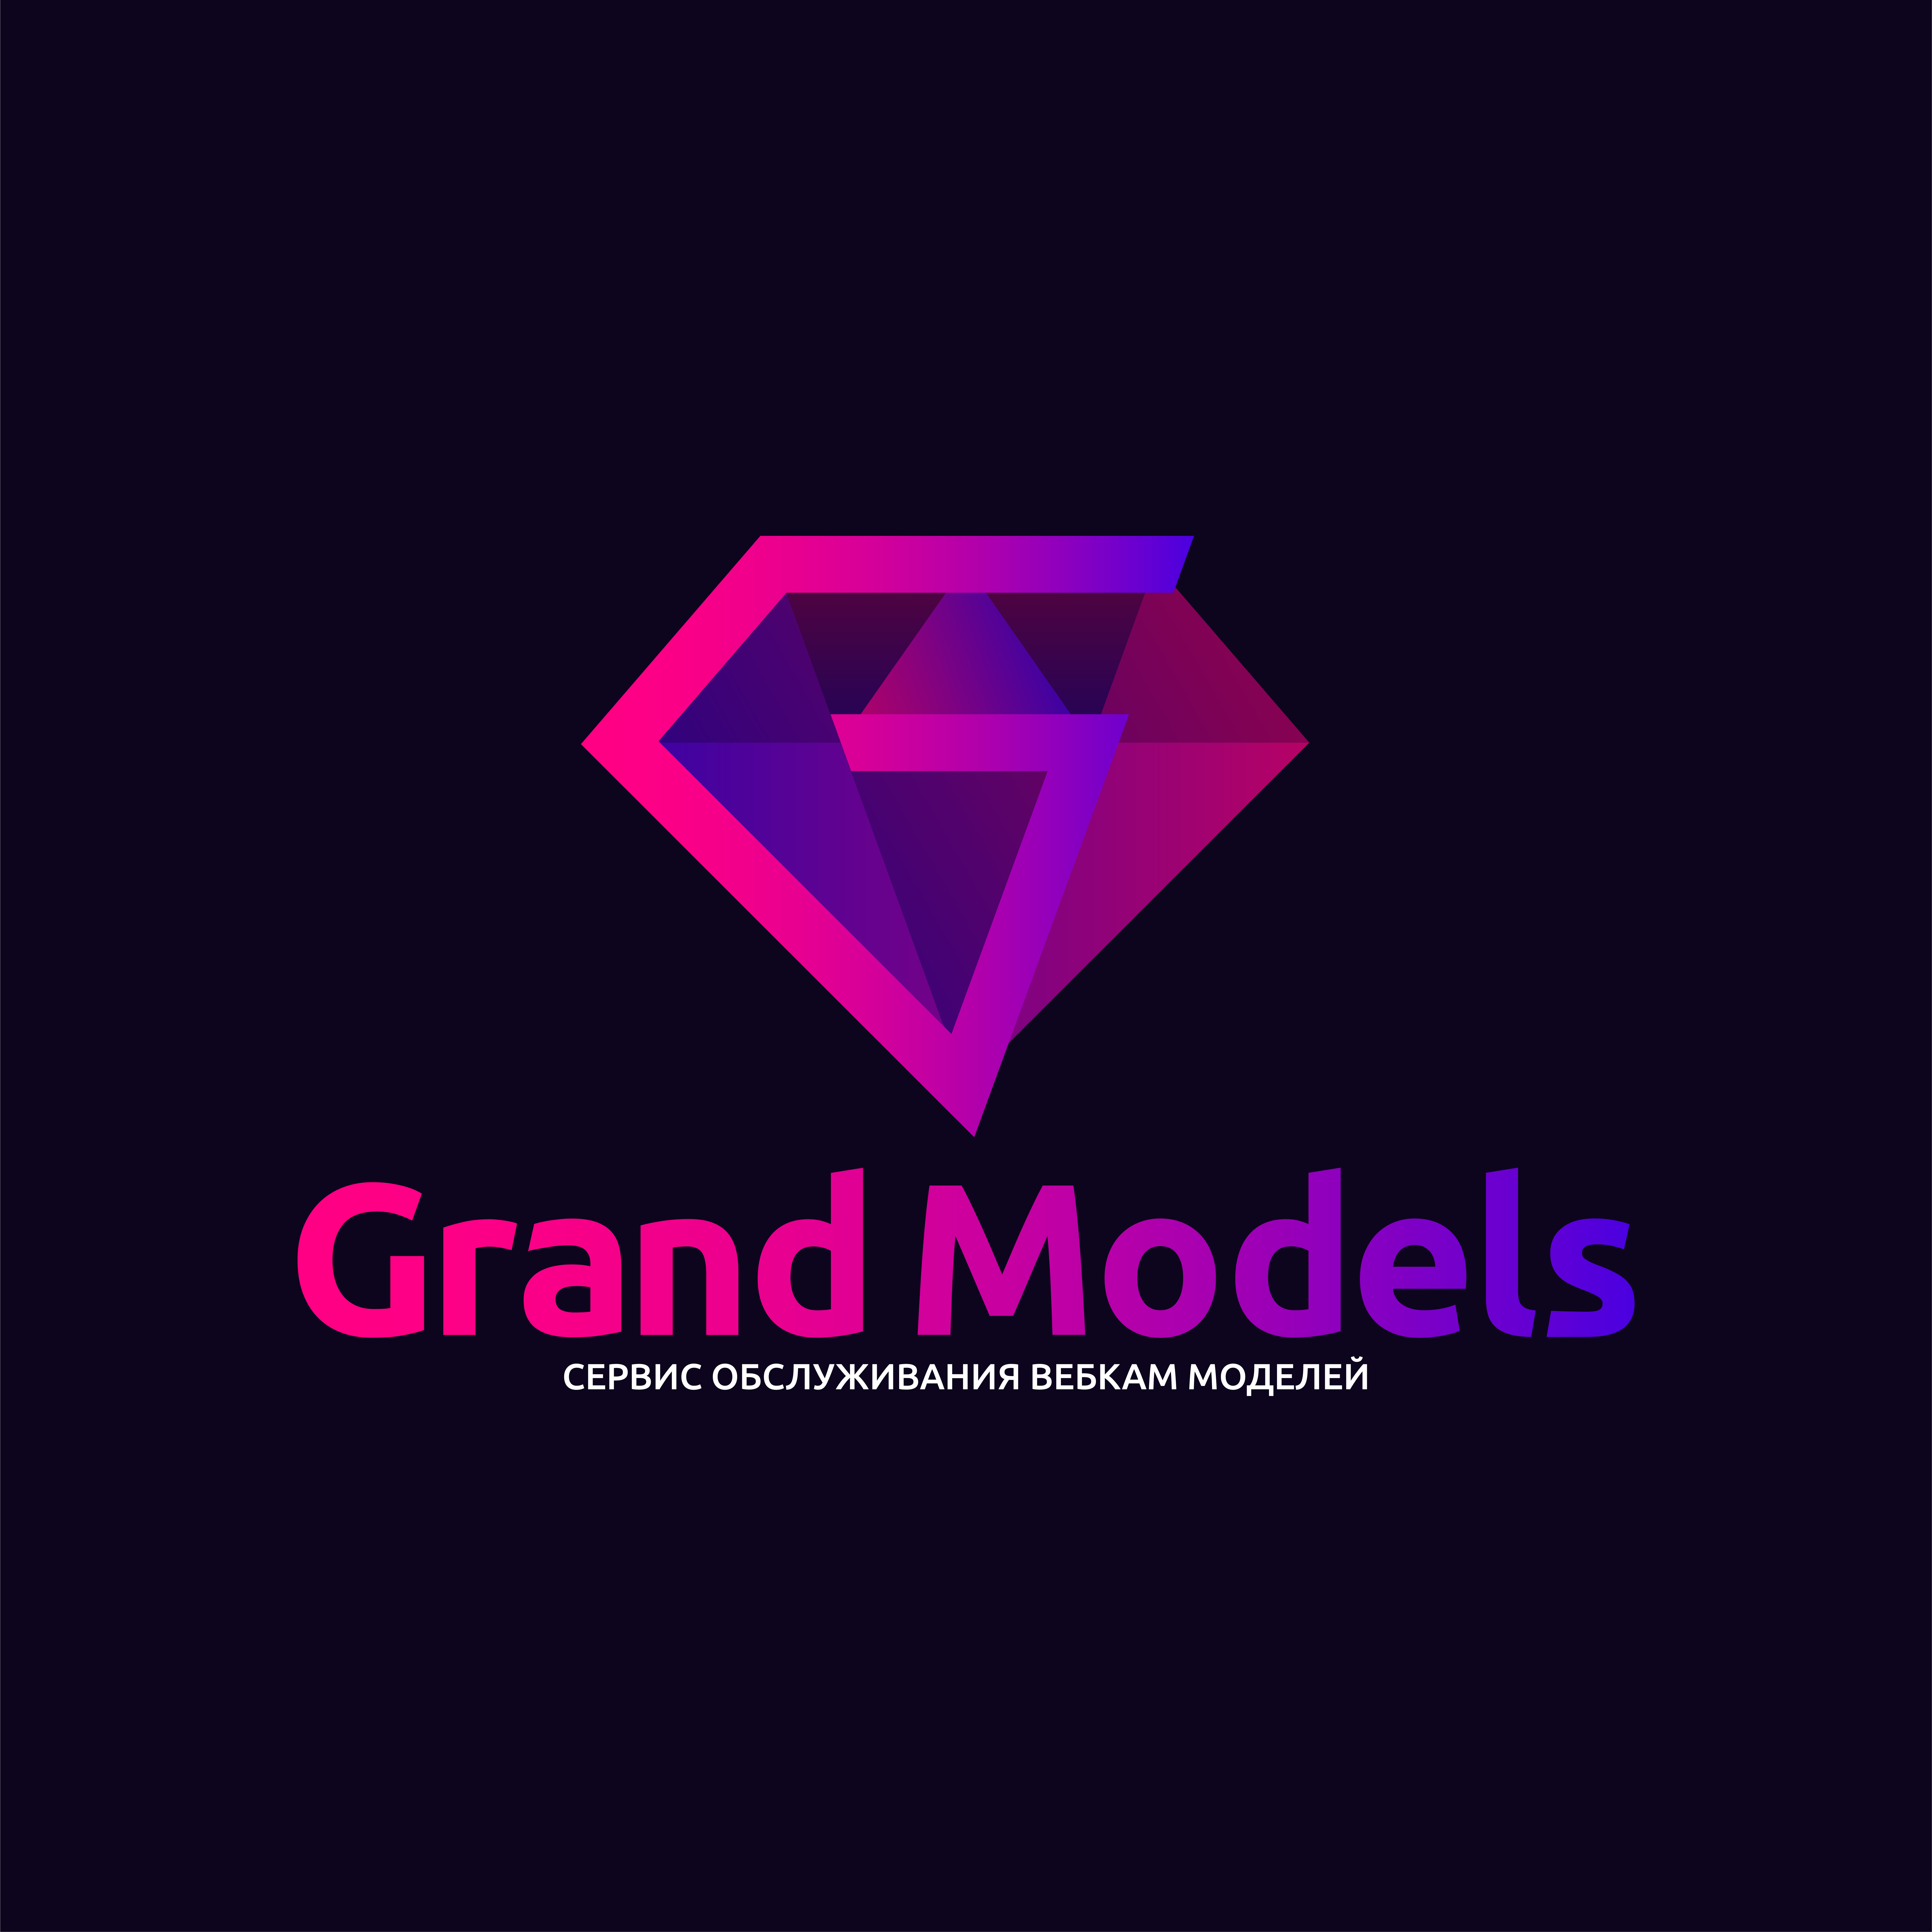 вебкам студия Grand models